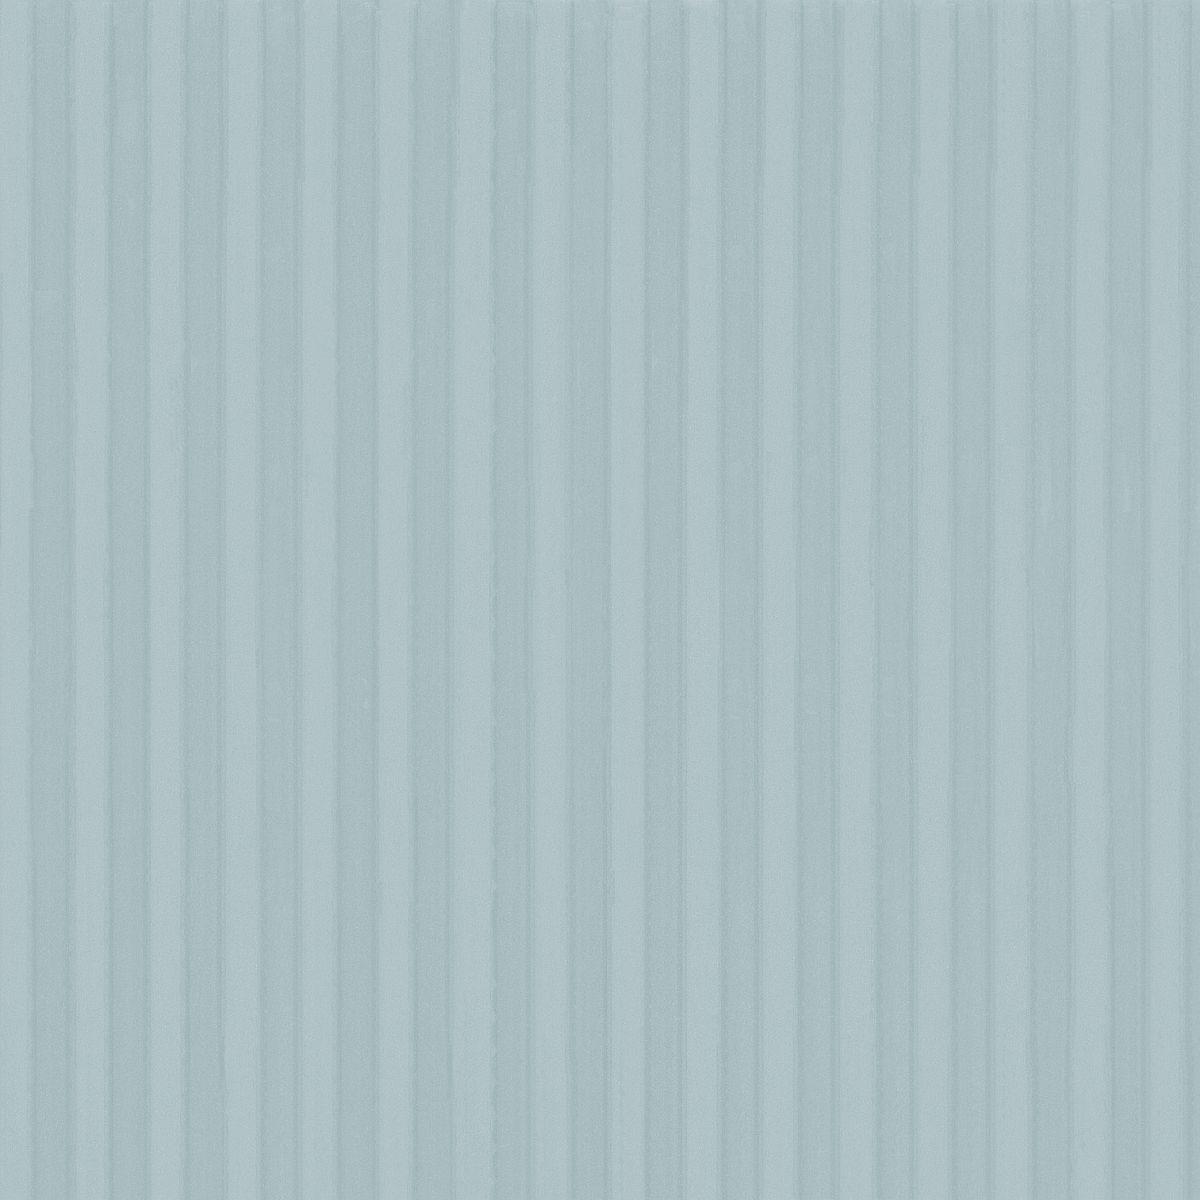 Hochwertige tapeten und stoffe vinyltapete norwall - Tapete taubenblau ...